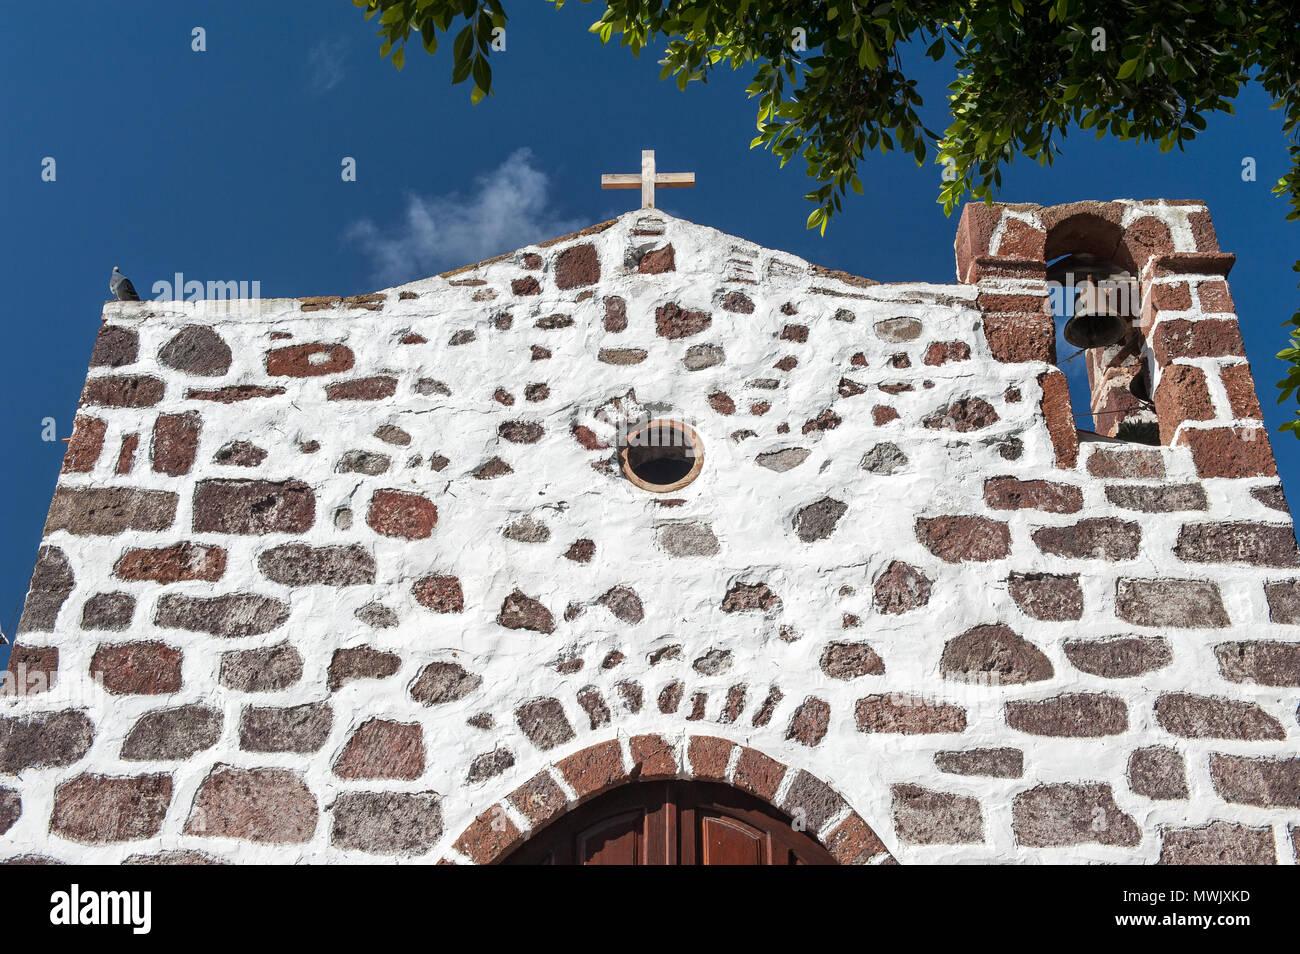 Kirche, Masca, Teneriffa, Kanarische Inseln, Spanien Stockbild